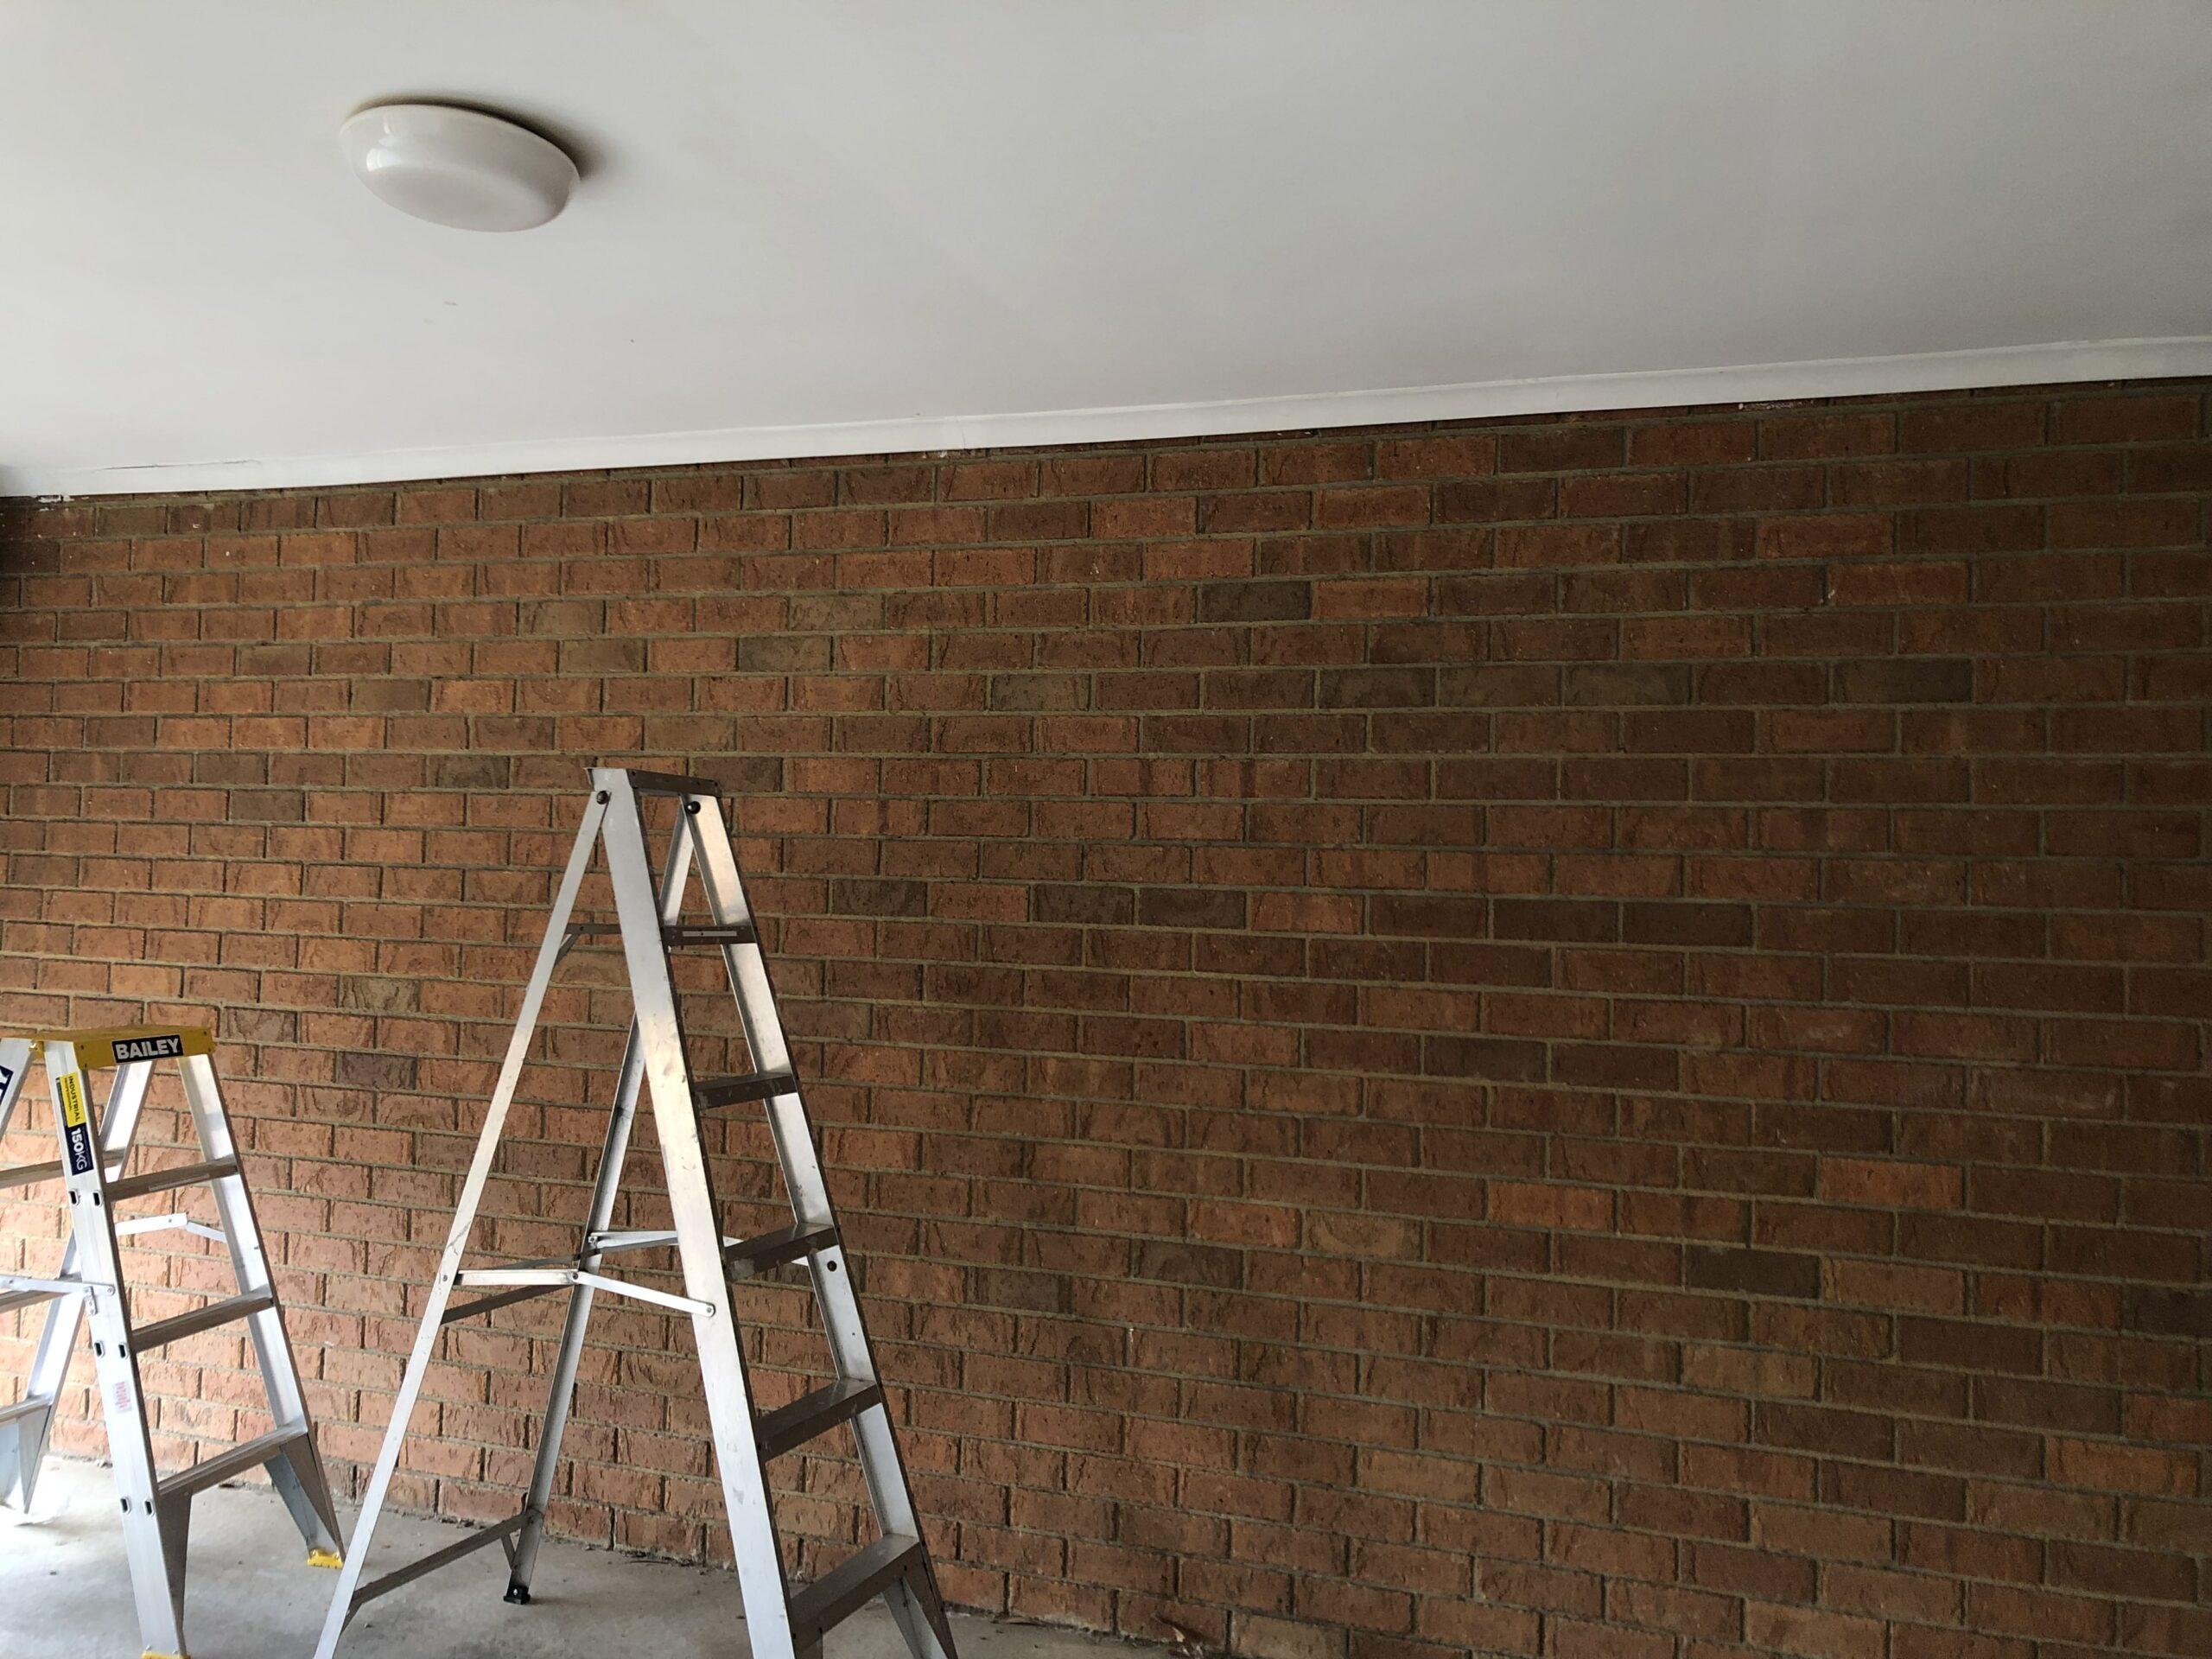 Shelves on a Brick Wall